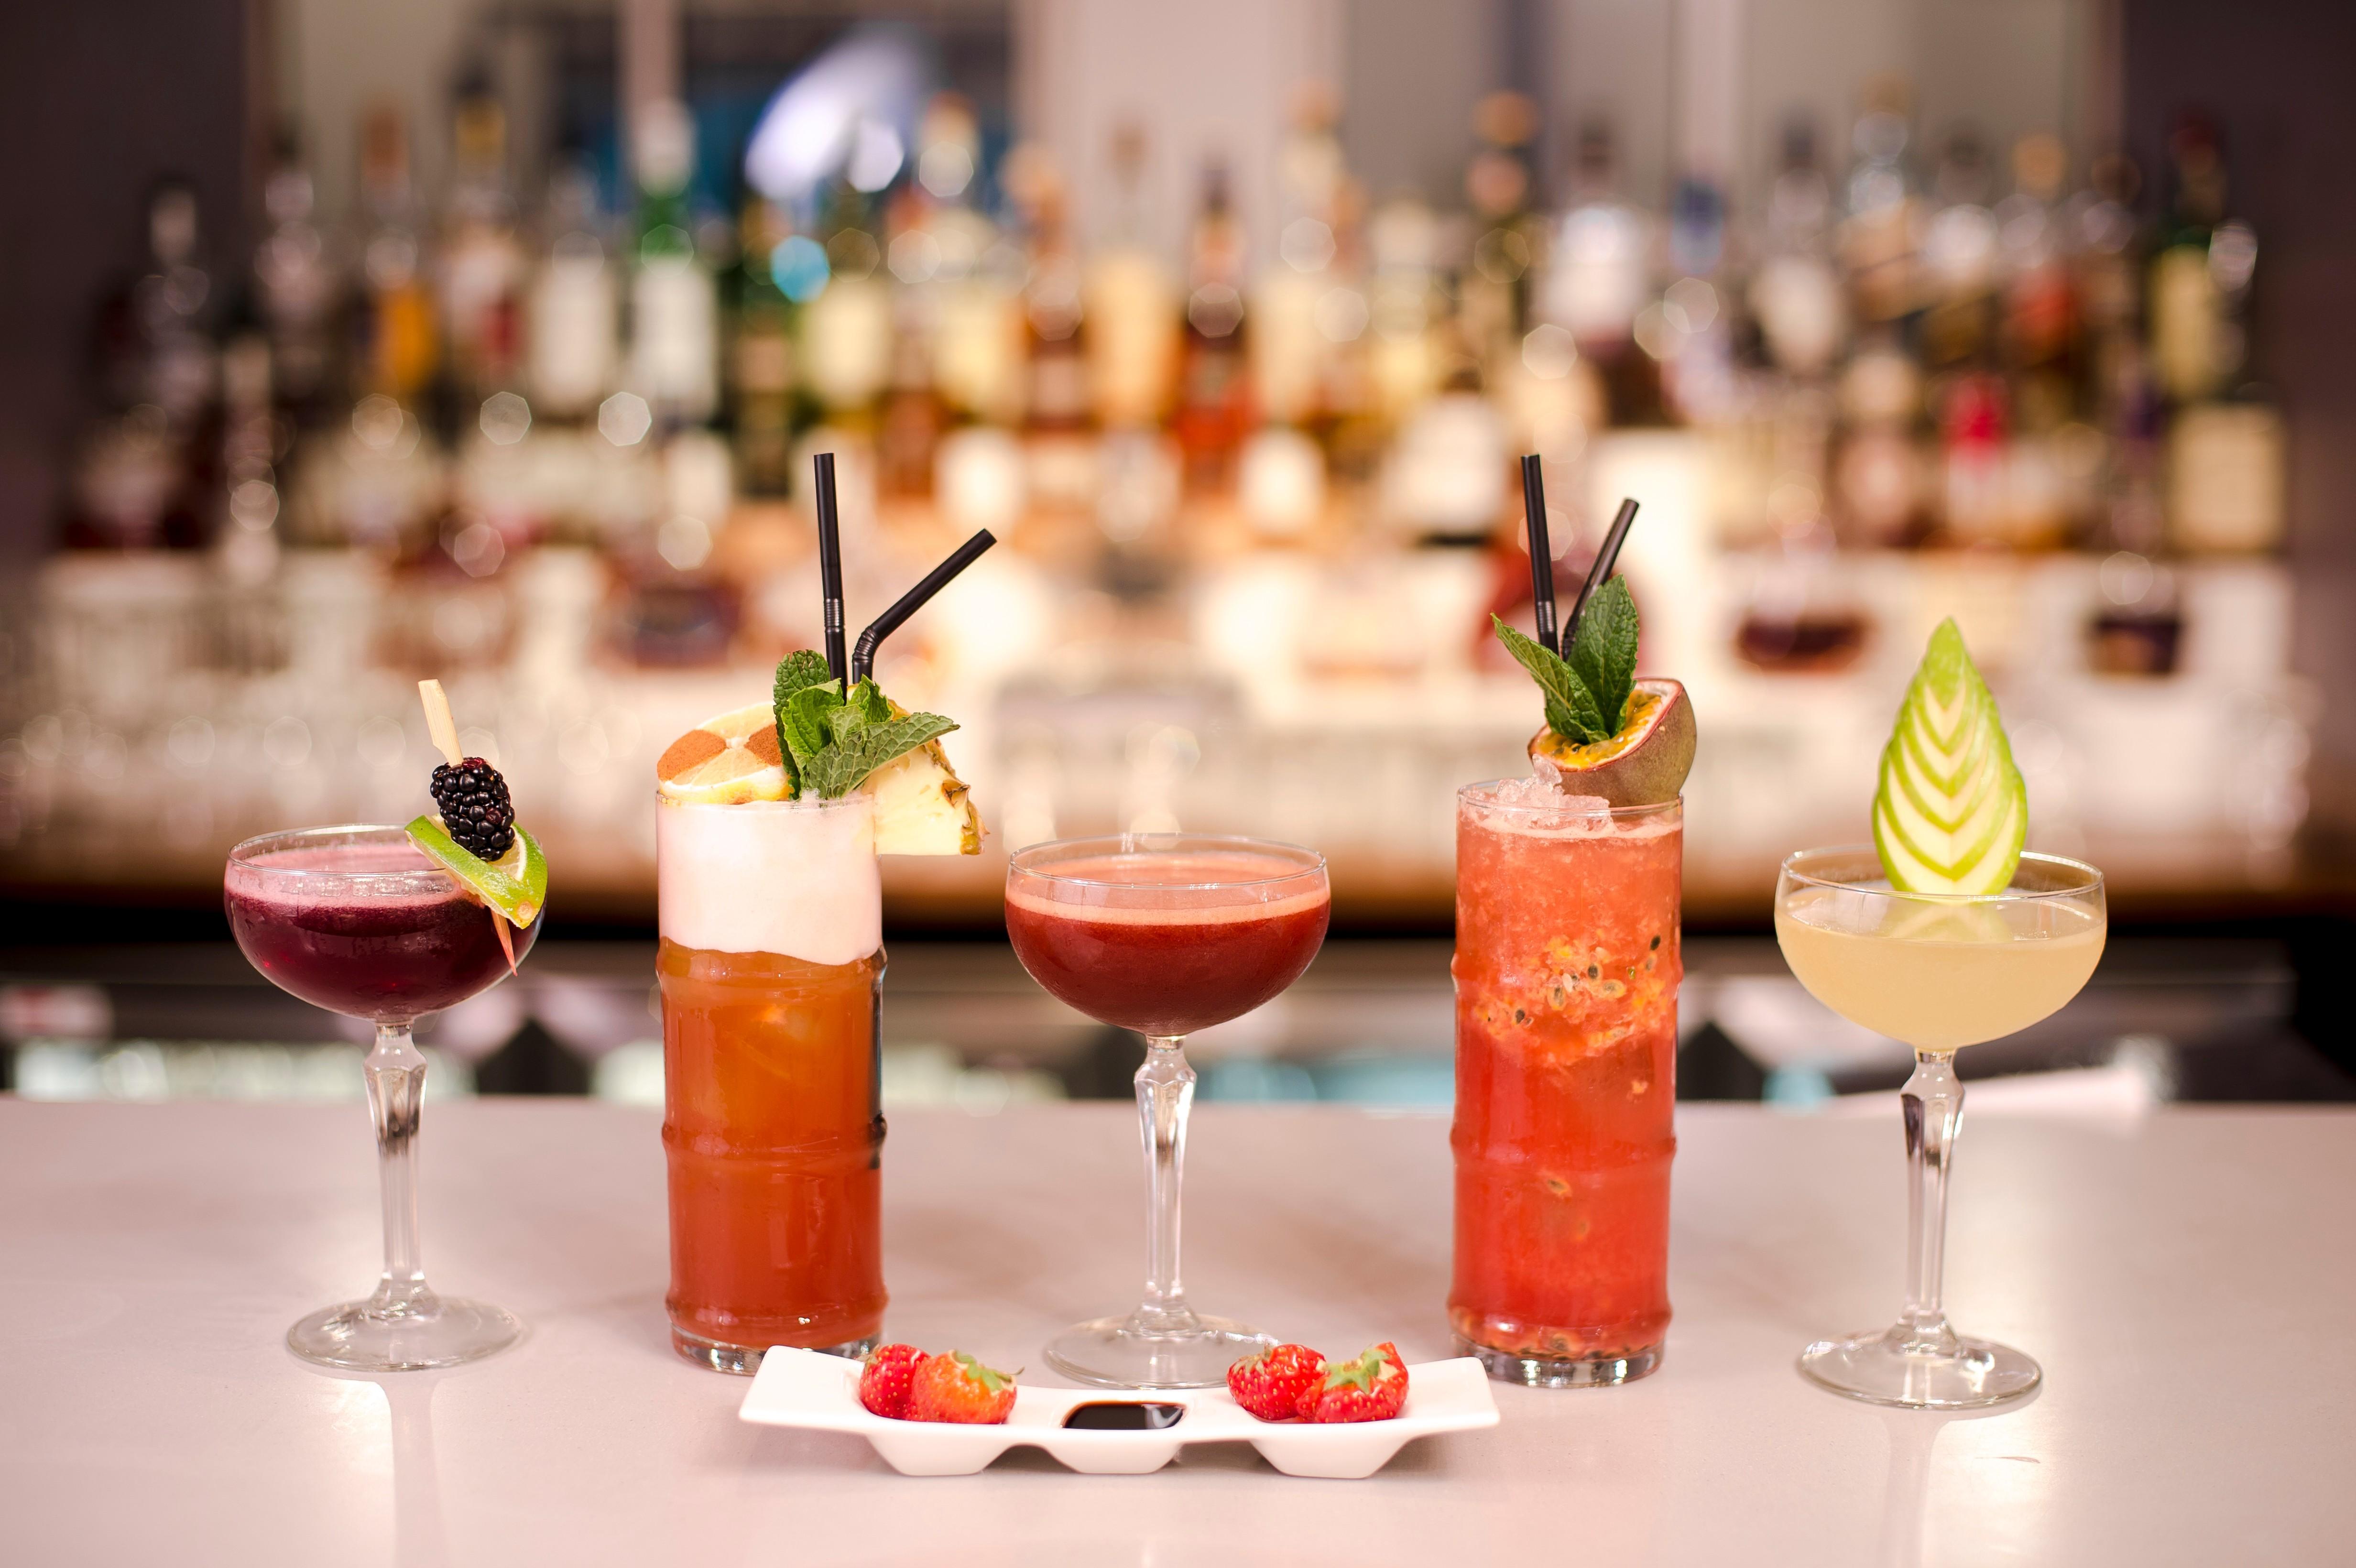 Cocktails_Burlesque Martini_Illusion Cocktail_Strawberry Daiquiri & Balsamic_The Optimistic_Camomile & Apple Martini-3.jpg